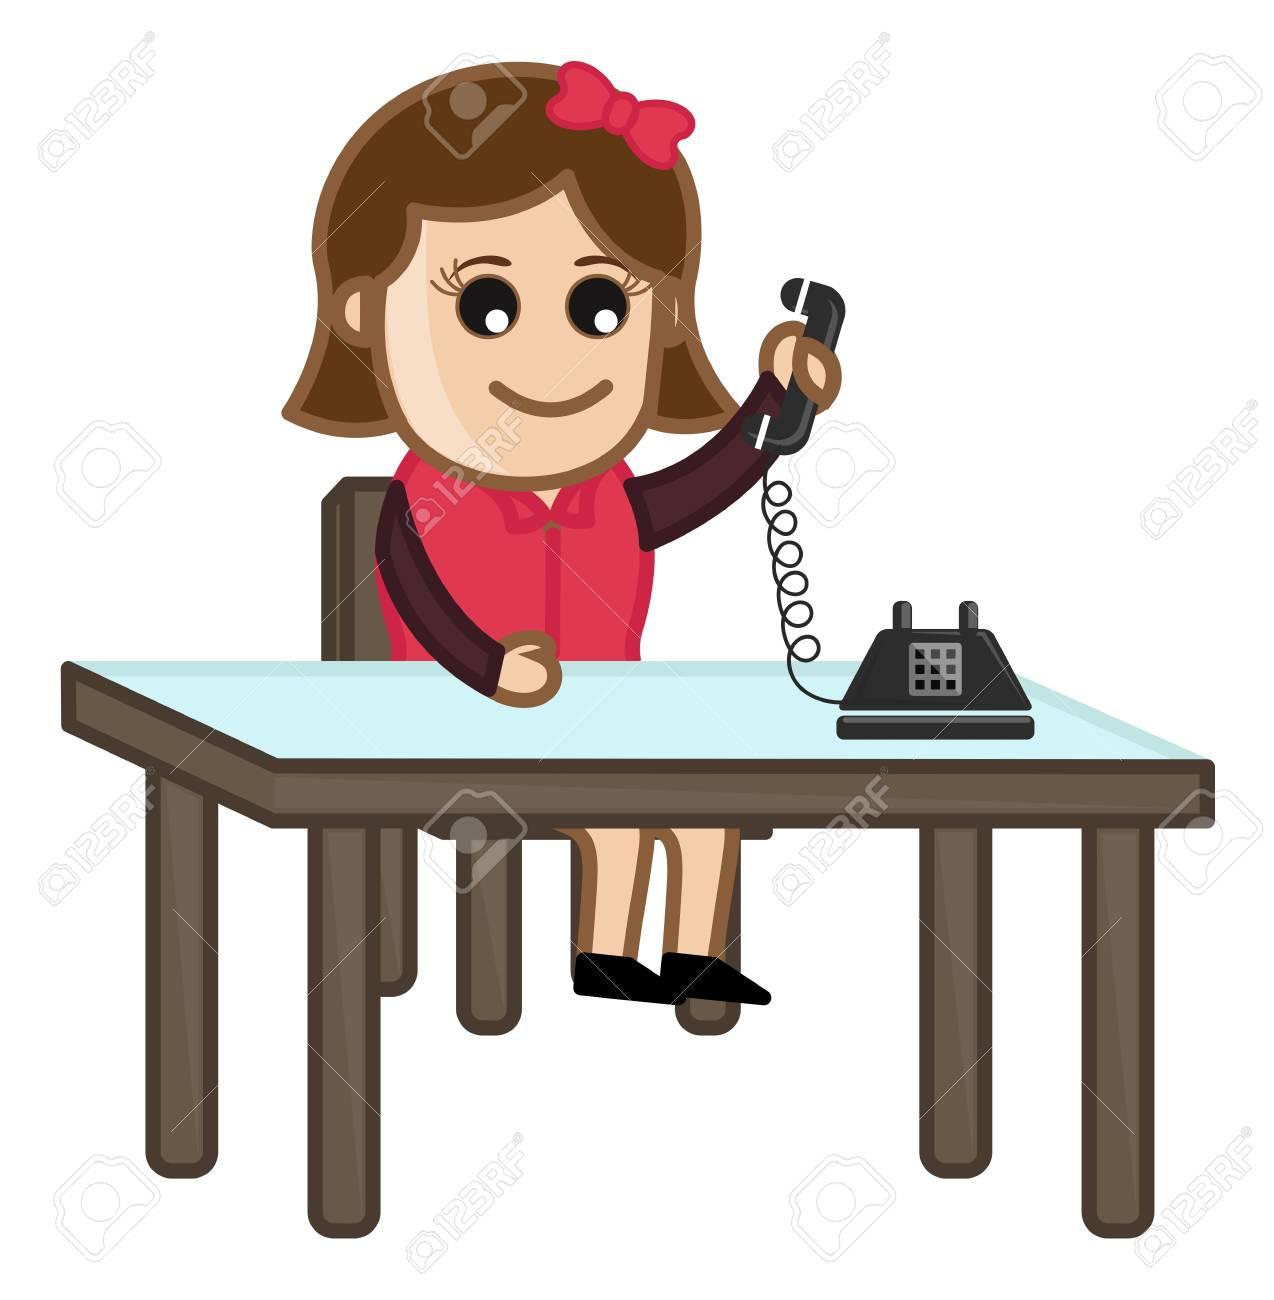 Woman Receiving a Phone Call Stock Vector - 20771394